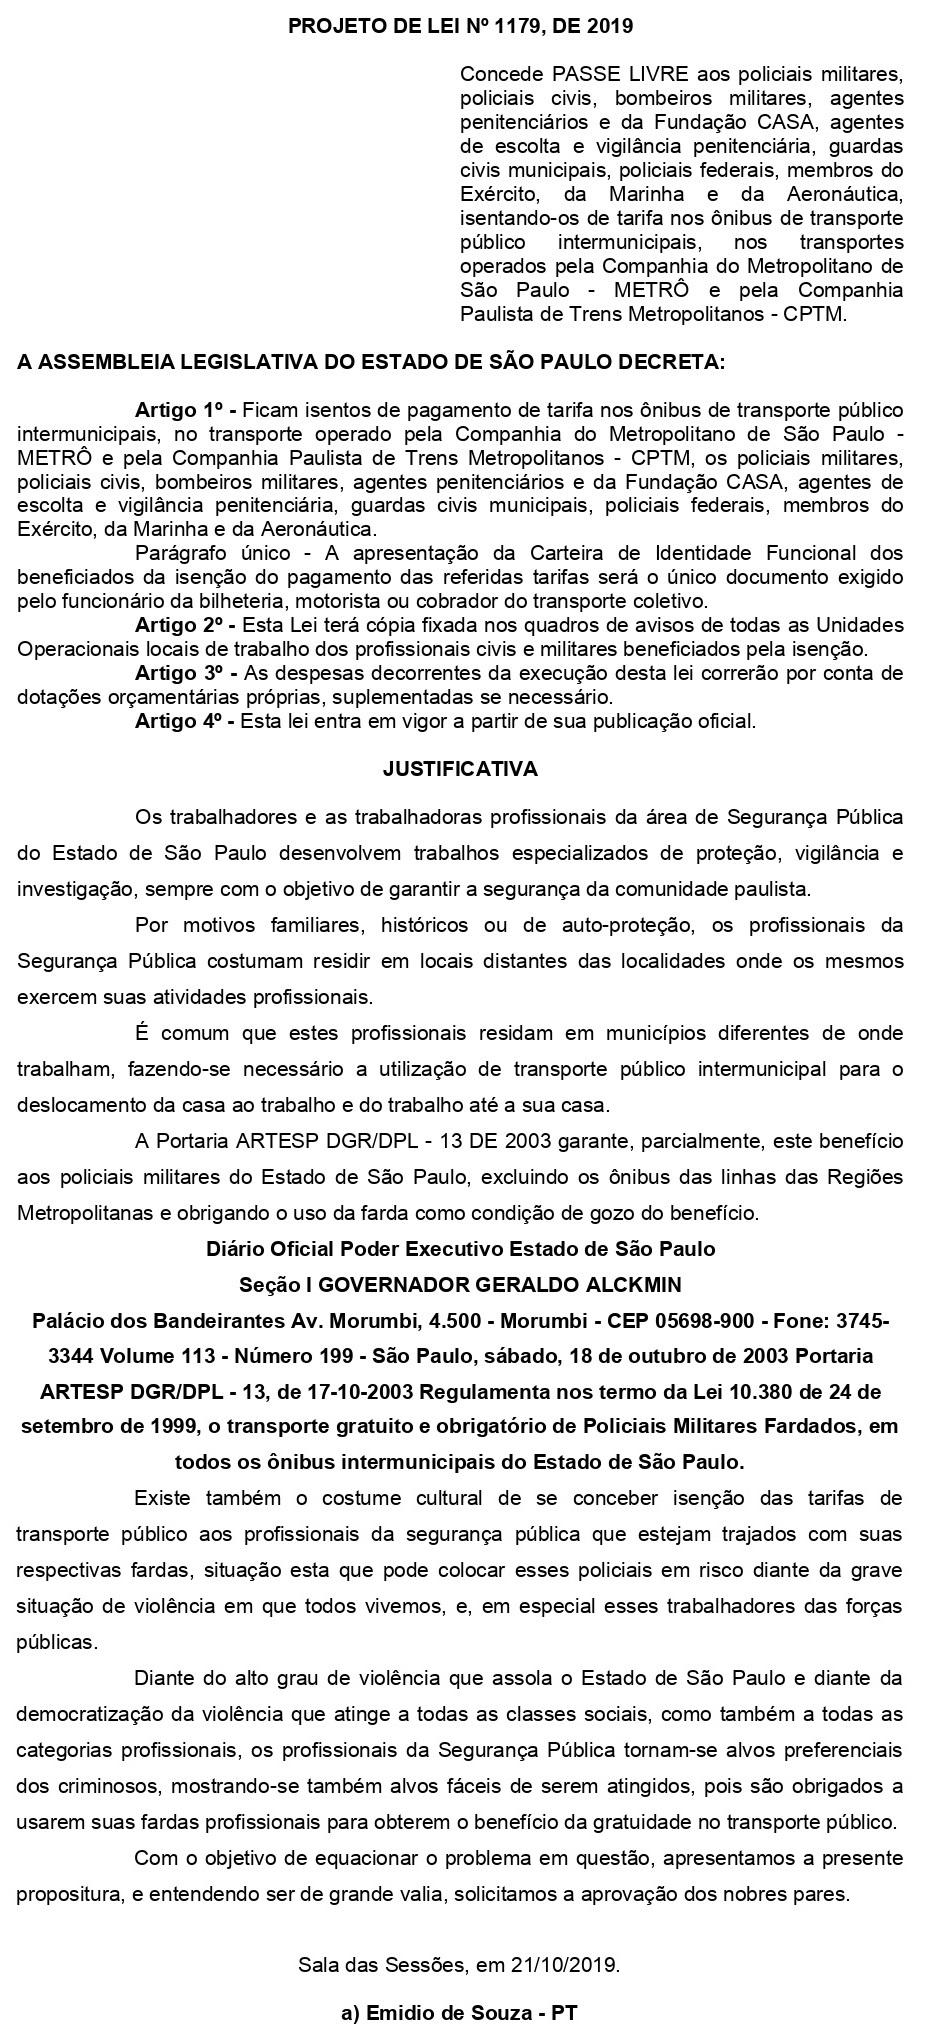 PL1179_Passe_Livre_Alesp.jpg